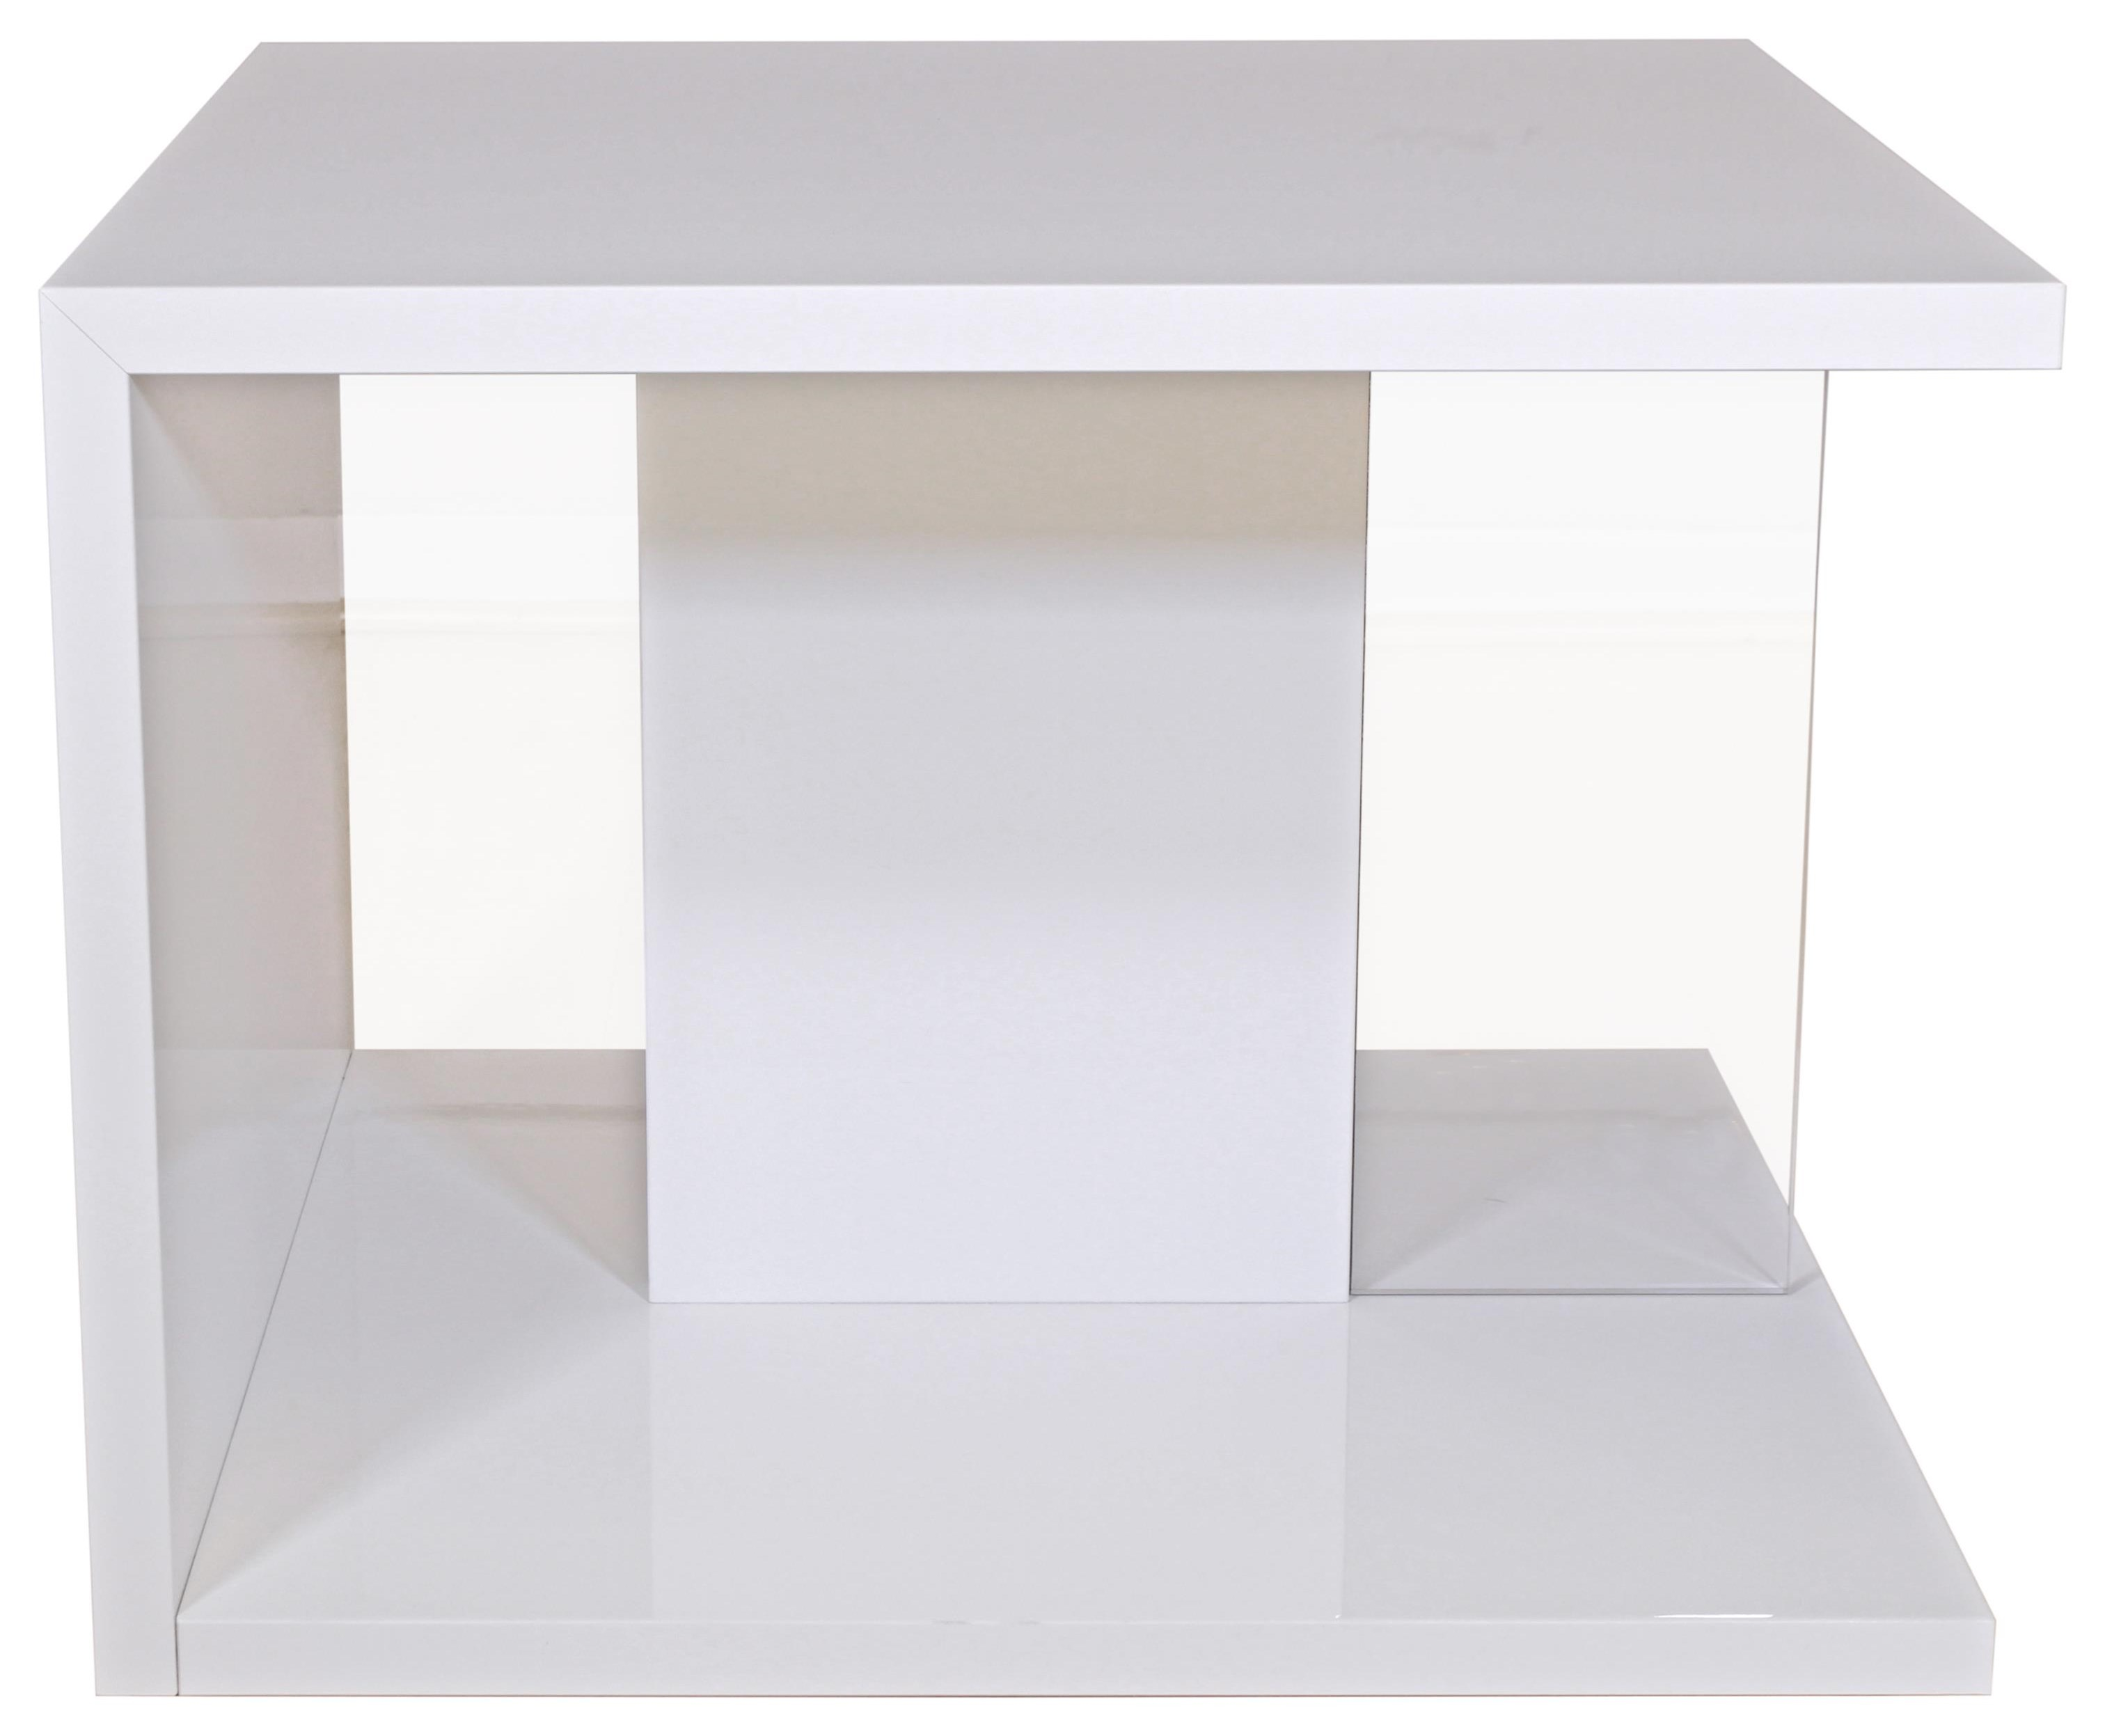 Artemide Lamp Table by Alf Italia at HomeWorld Furniture